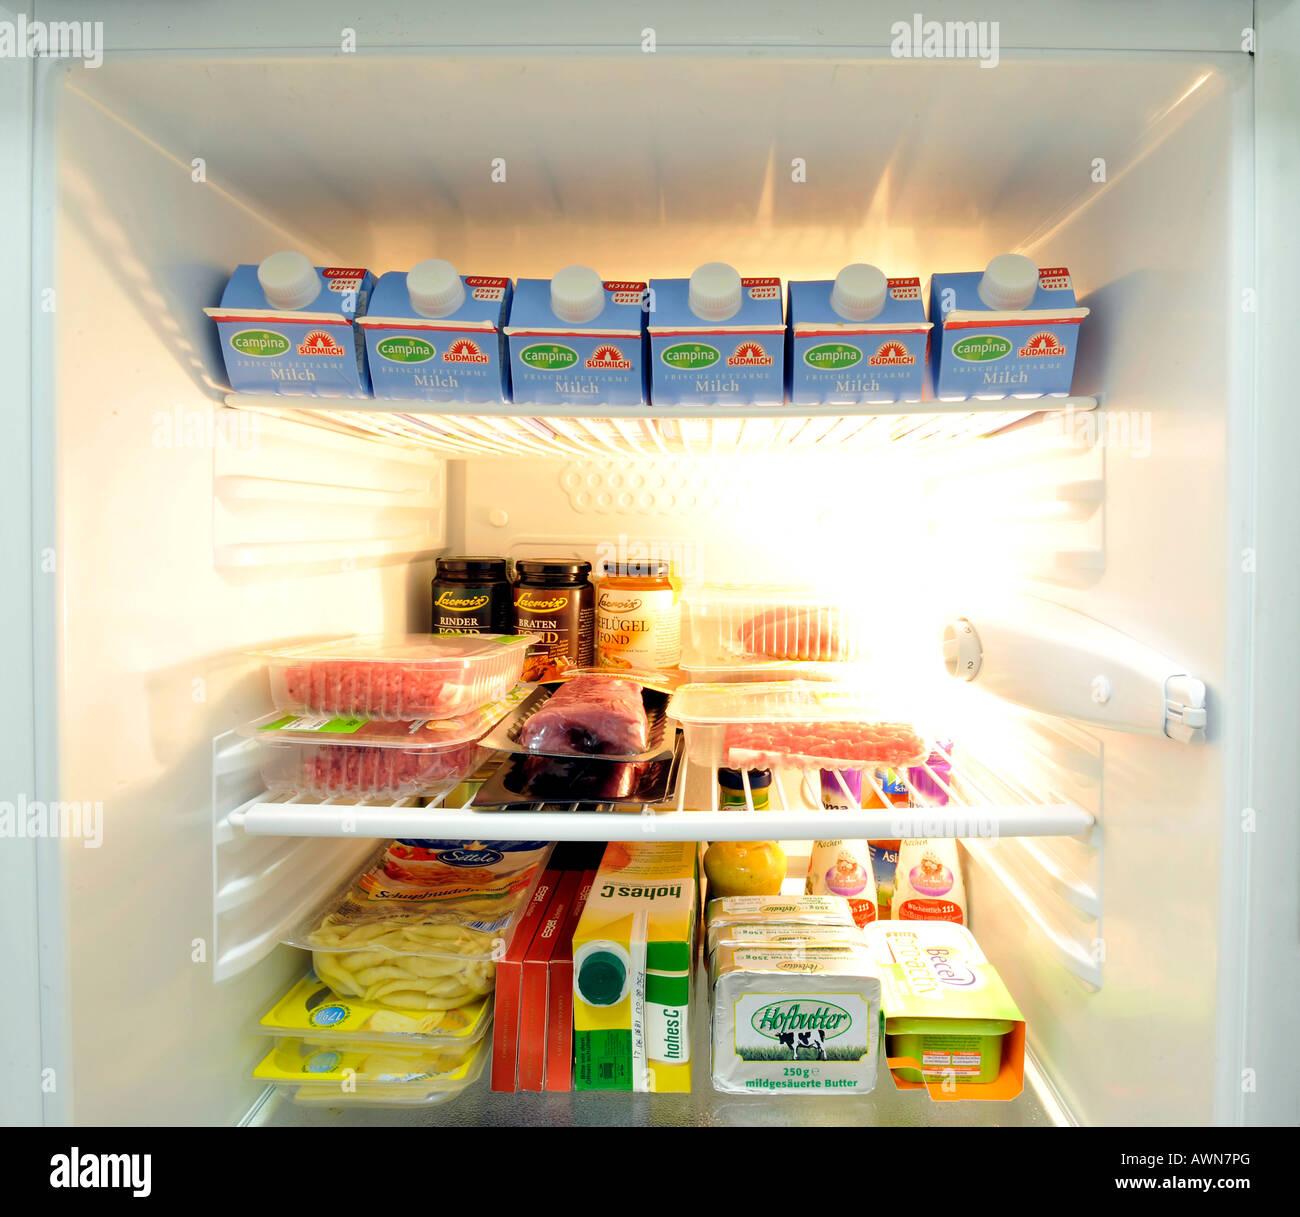 Refrigerator – inside view Stock Photo